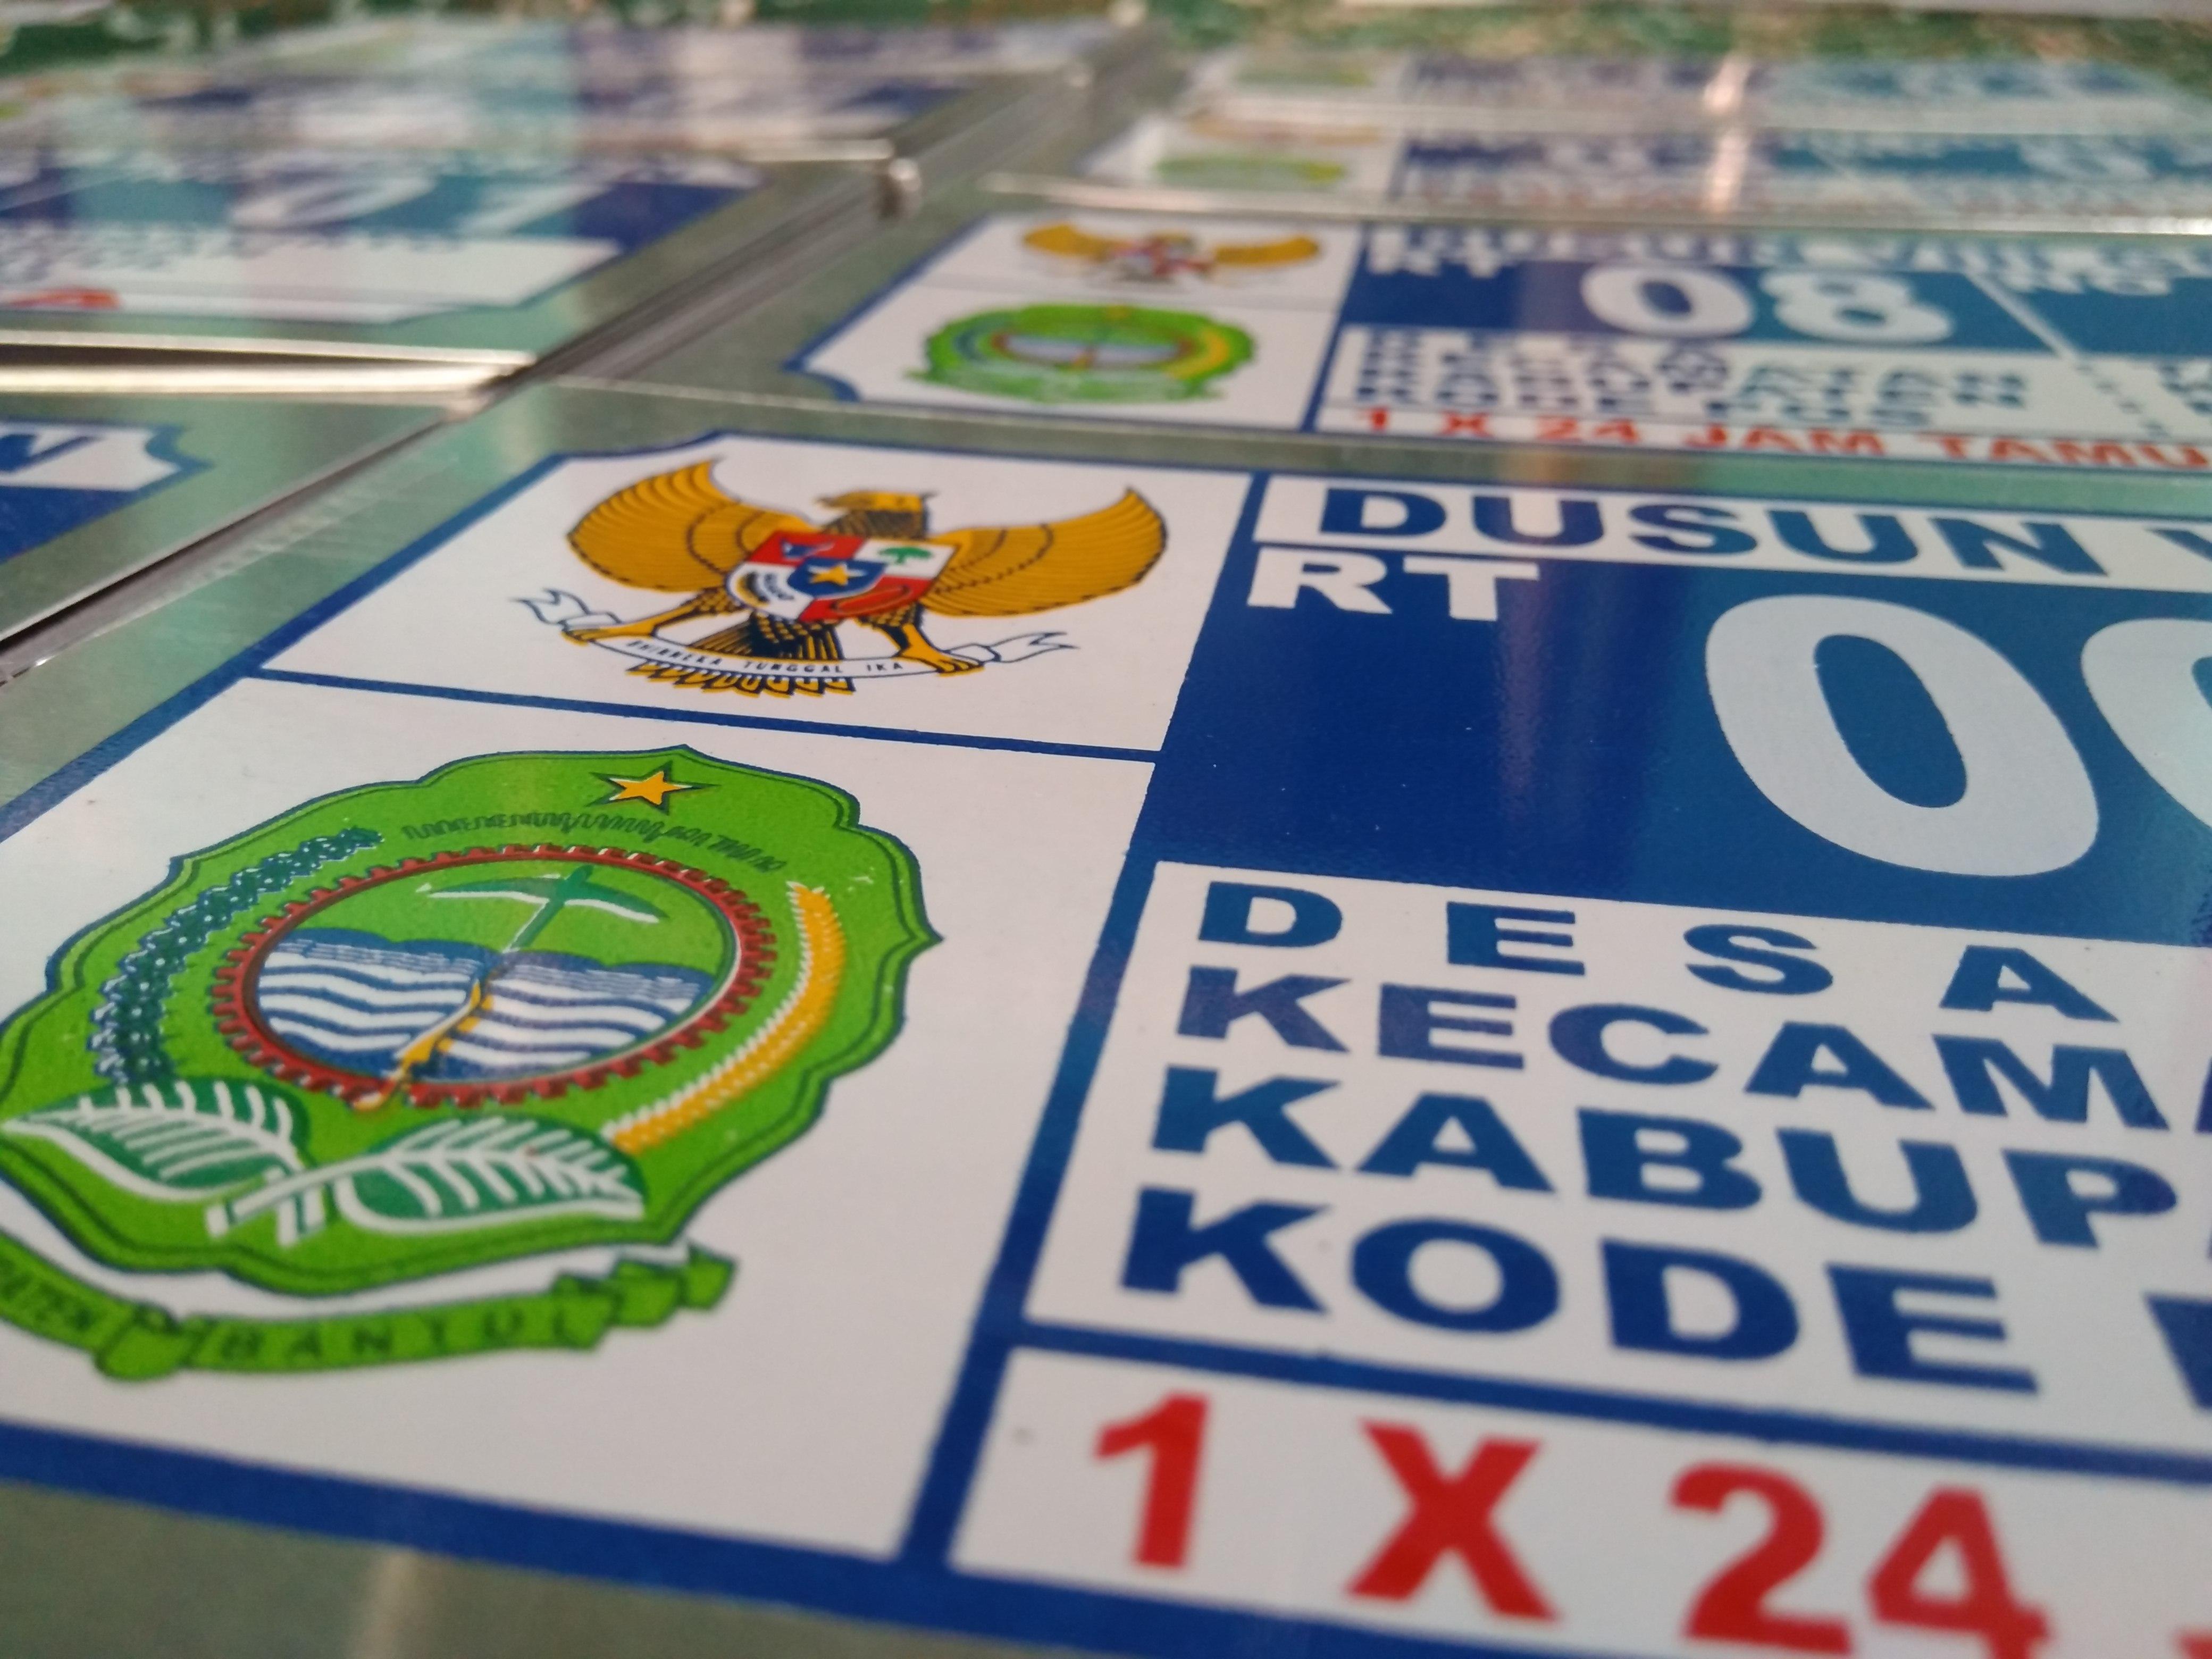 Jasa Pembuatan Plat Nomor Rumah Papan Iklan Sablon Advertising Harga